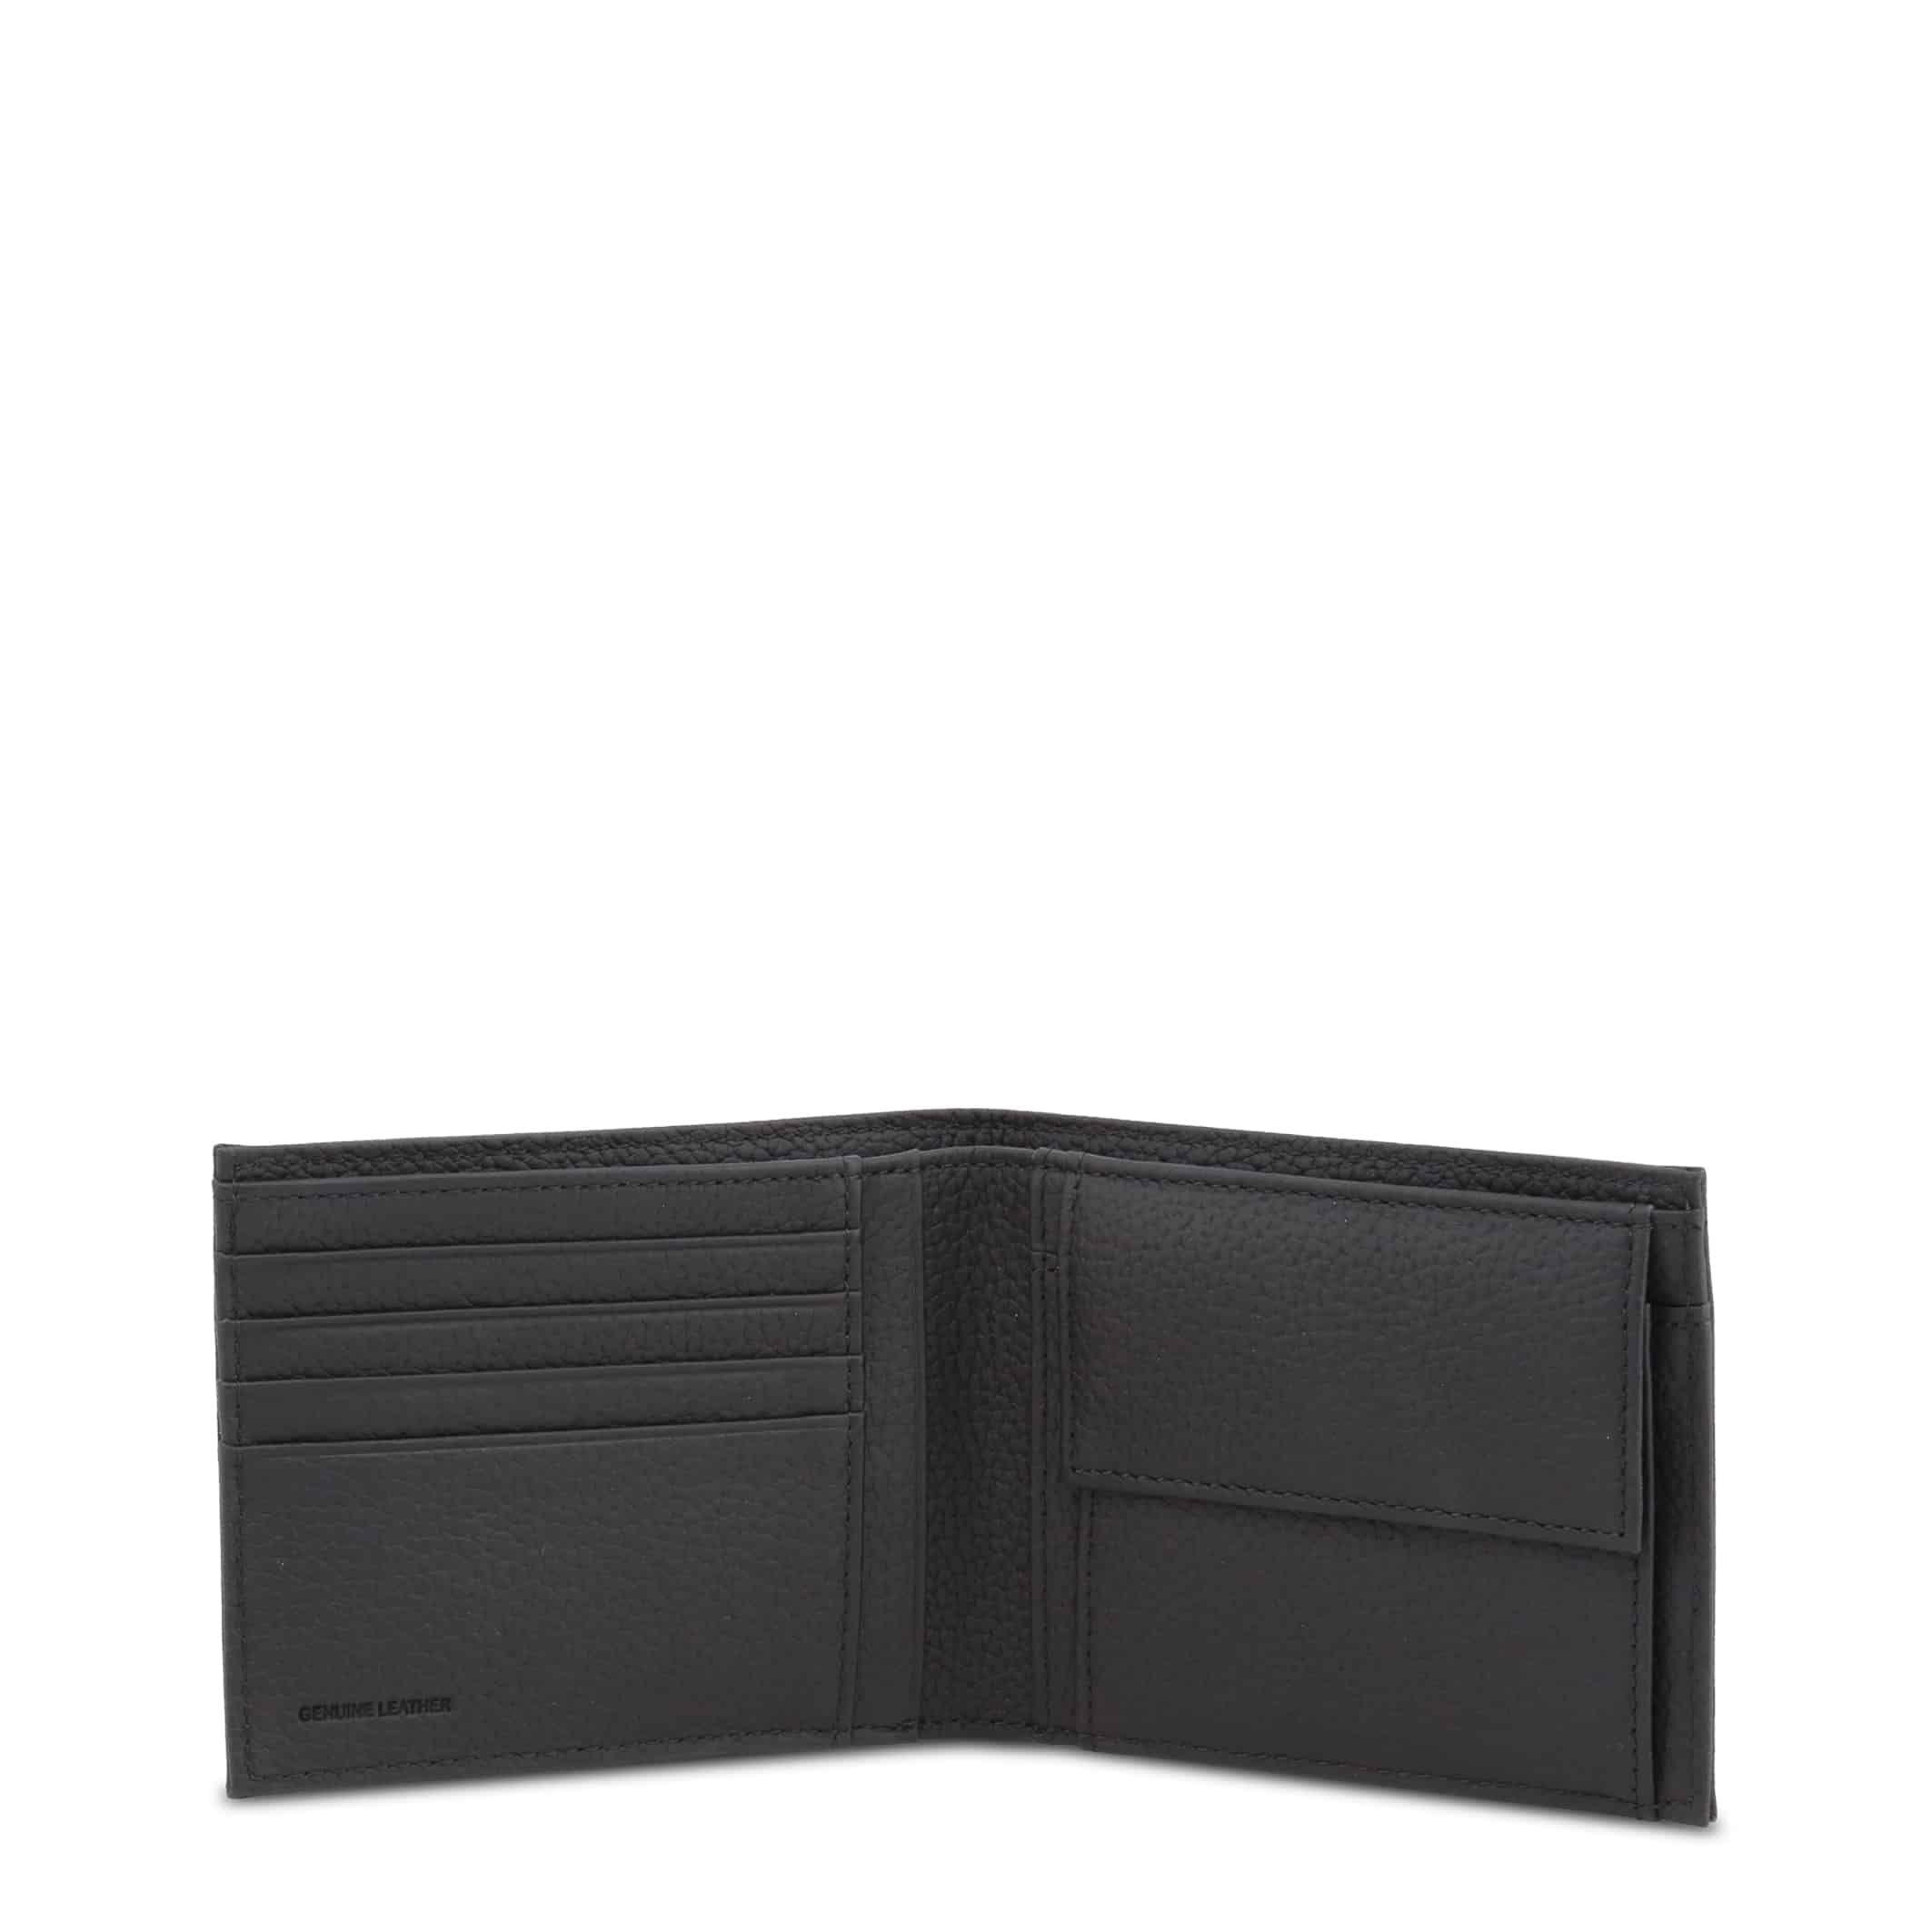 Box Armani Jeans – 937502_CD992_GIFTBOX